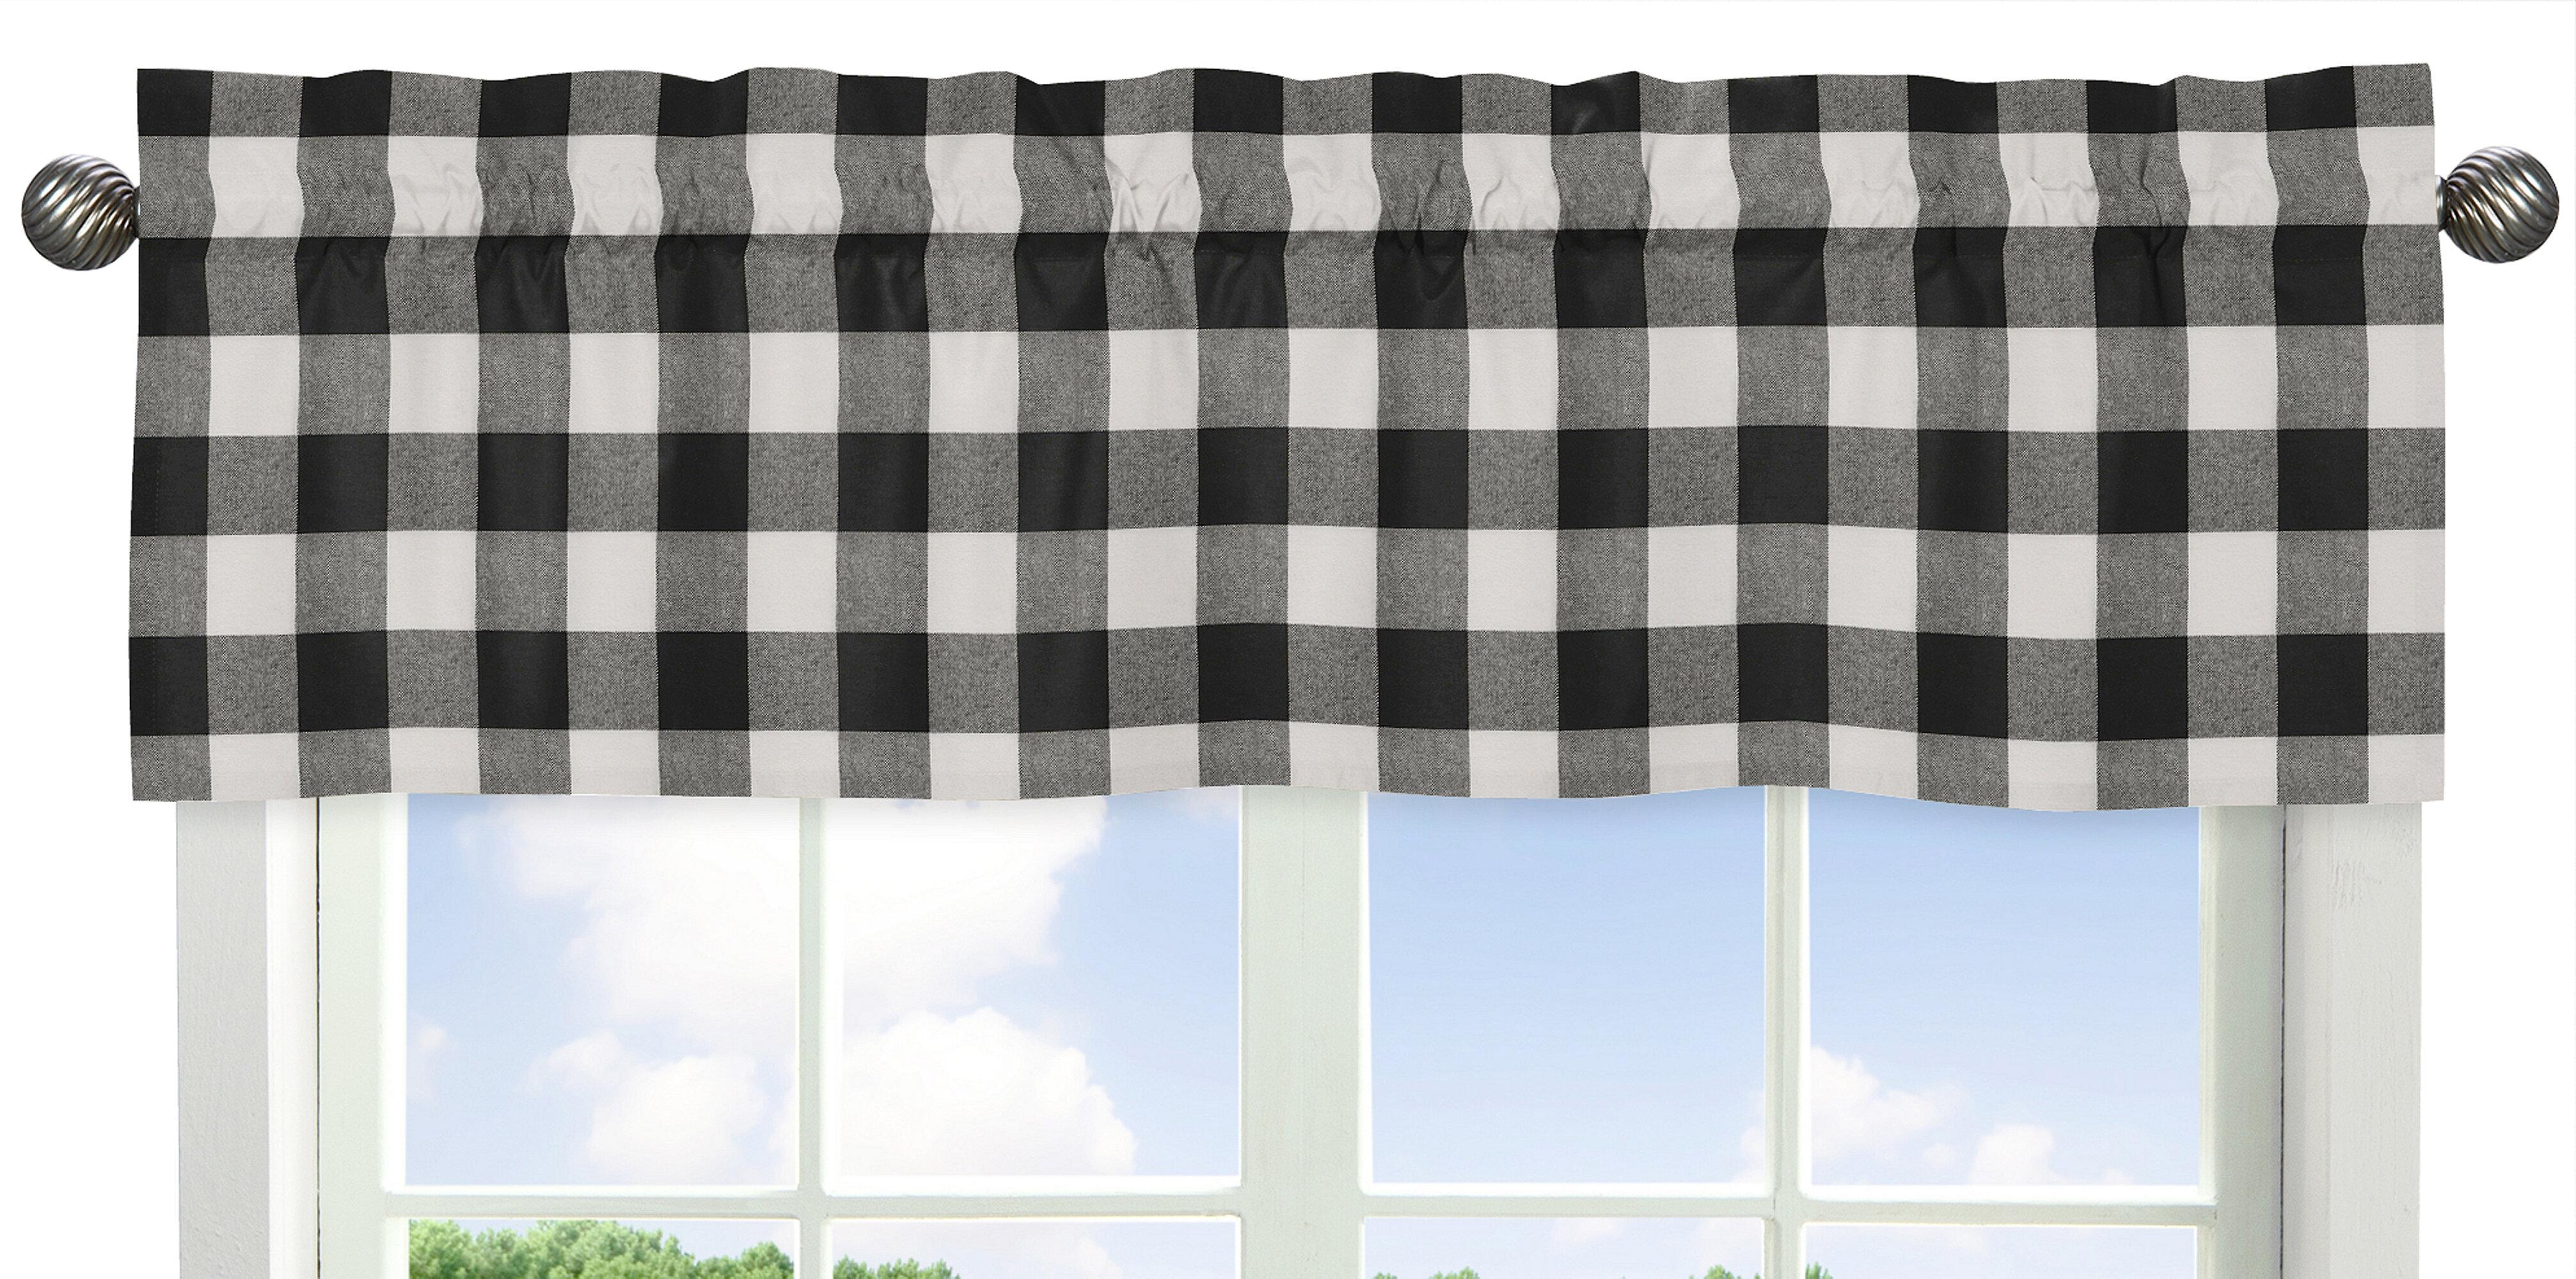 Sweet Jojo Designs Black And White Buffalo Check Collection Cotton Tailored 54 Window Valance Reviews Wayfair